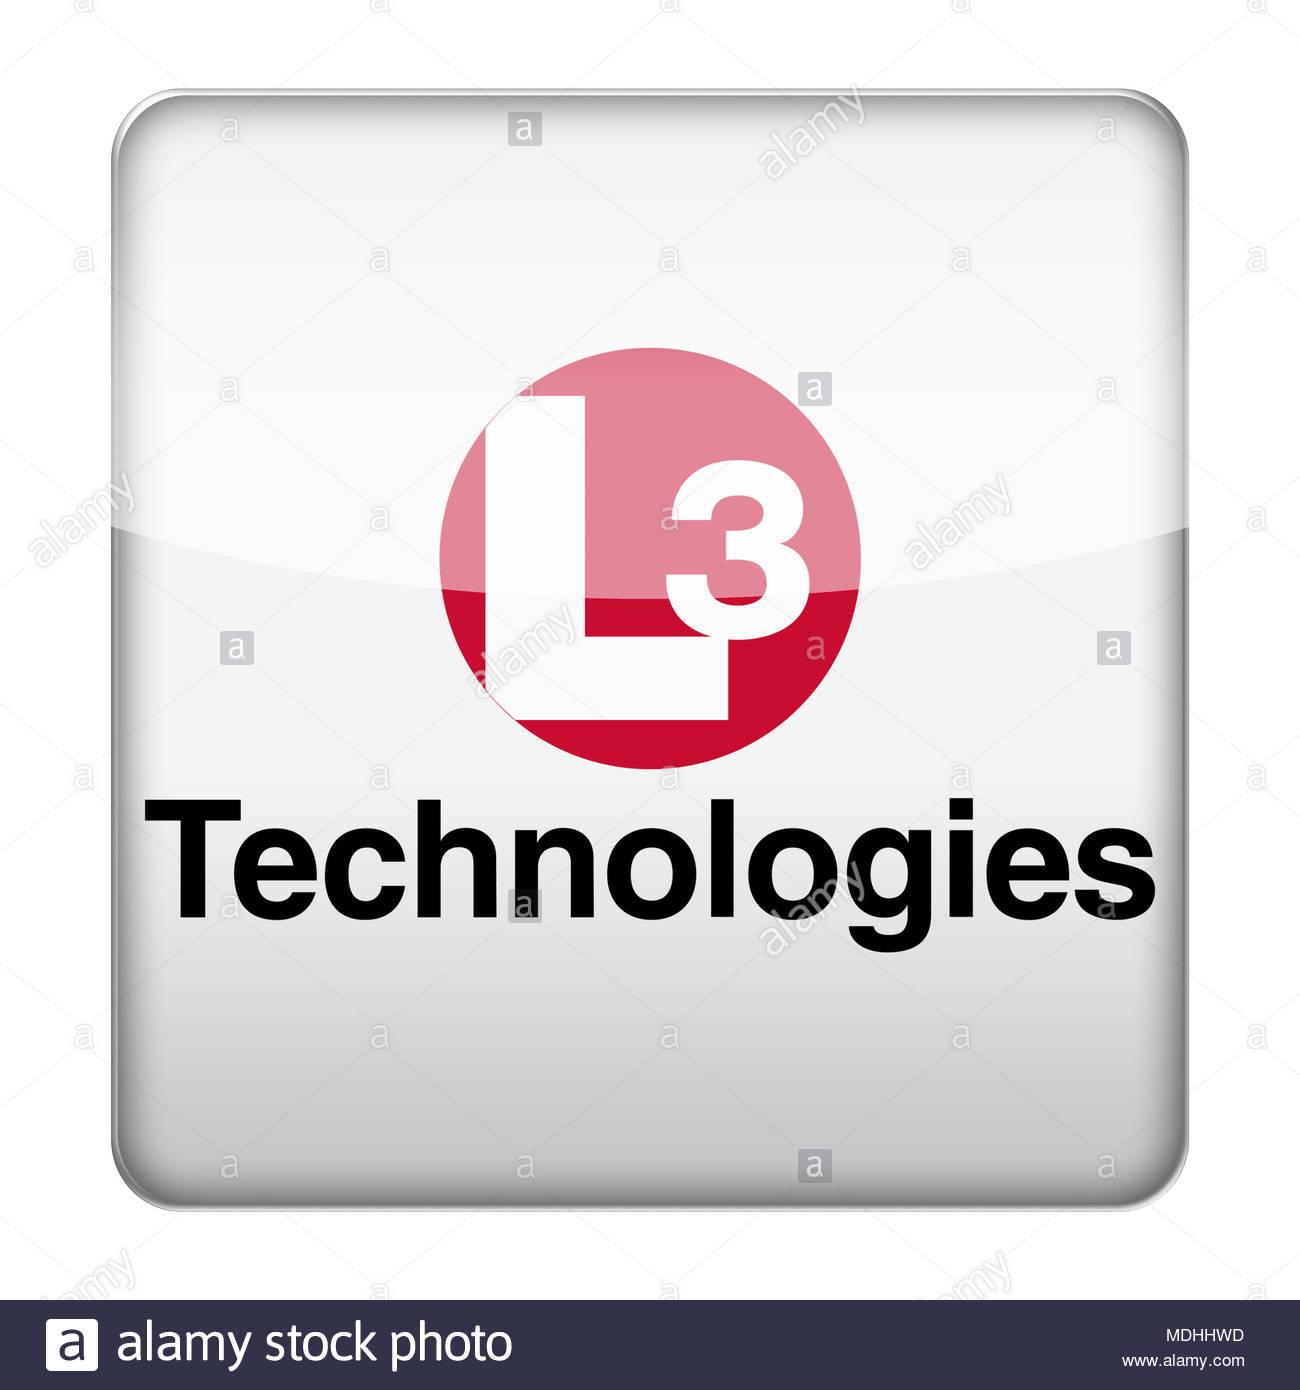 L3 Technologies logo icon - Stock Image